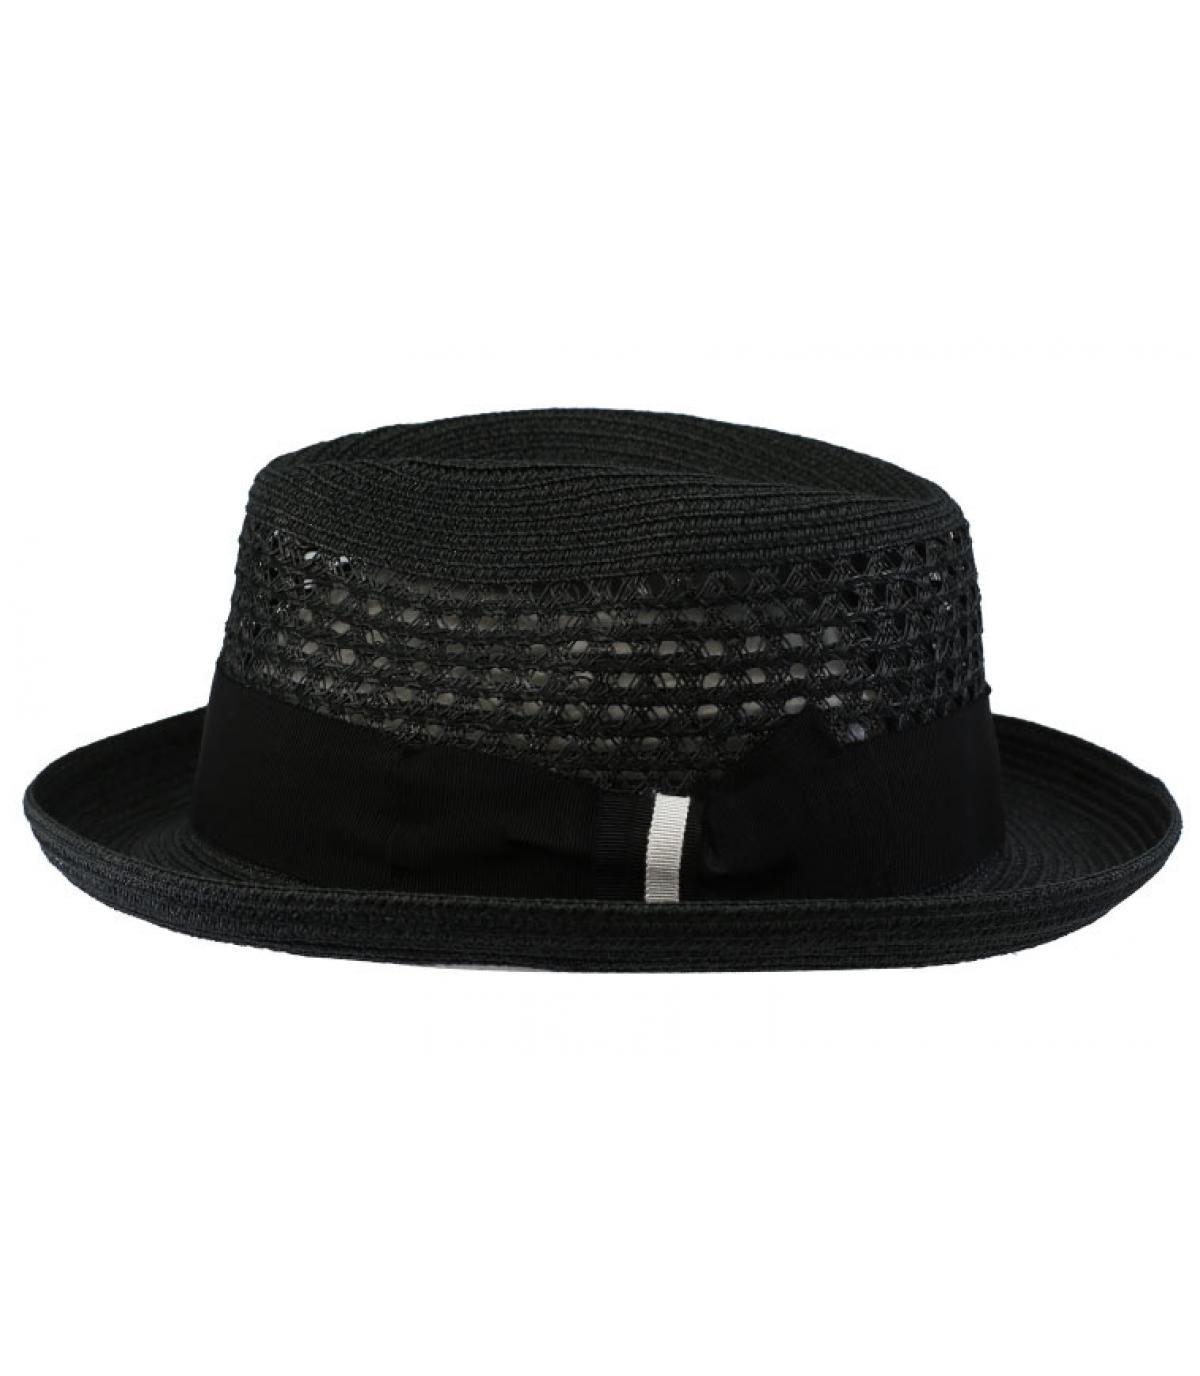 6910cb3b5212c ... black straw hat Bailey - Wilshire solid black Bailey - image 2 ...